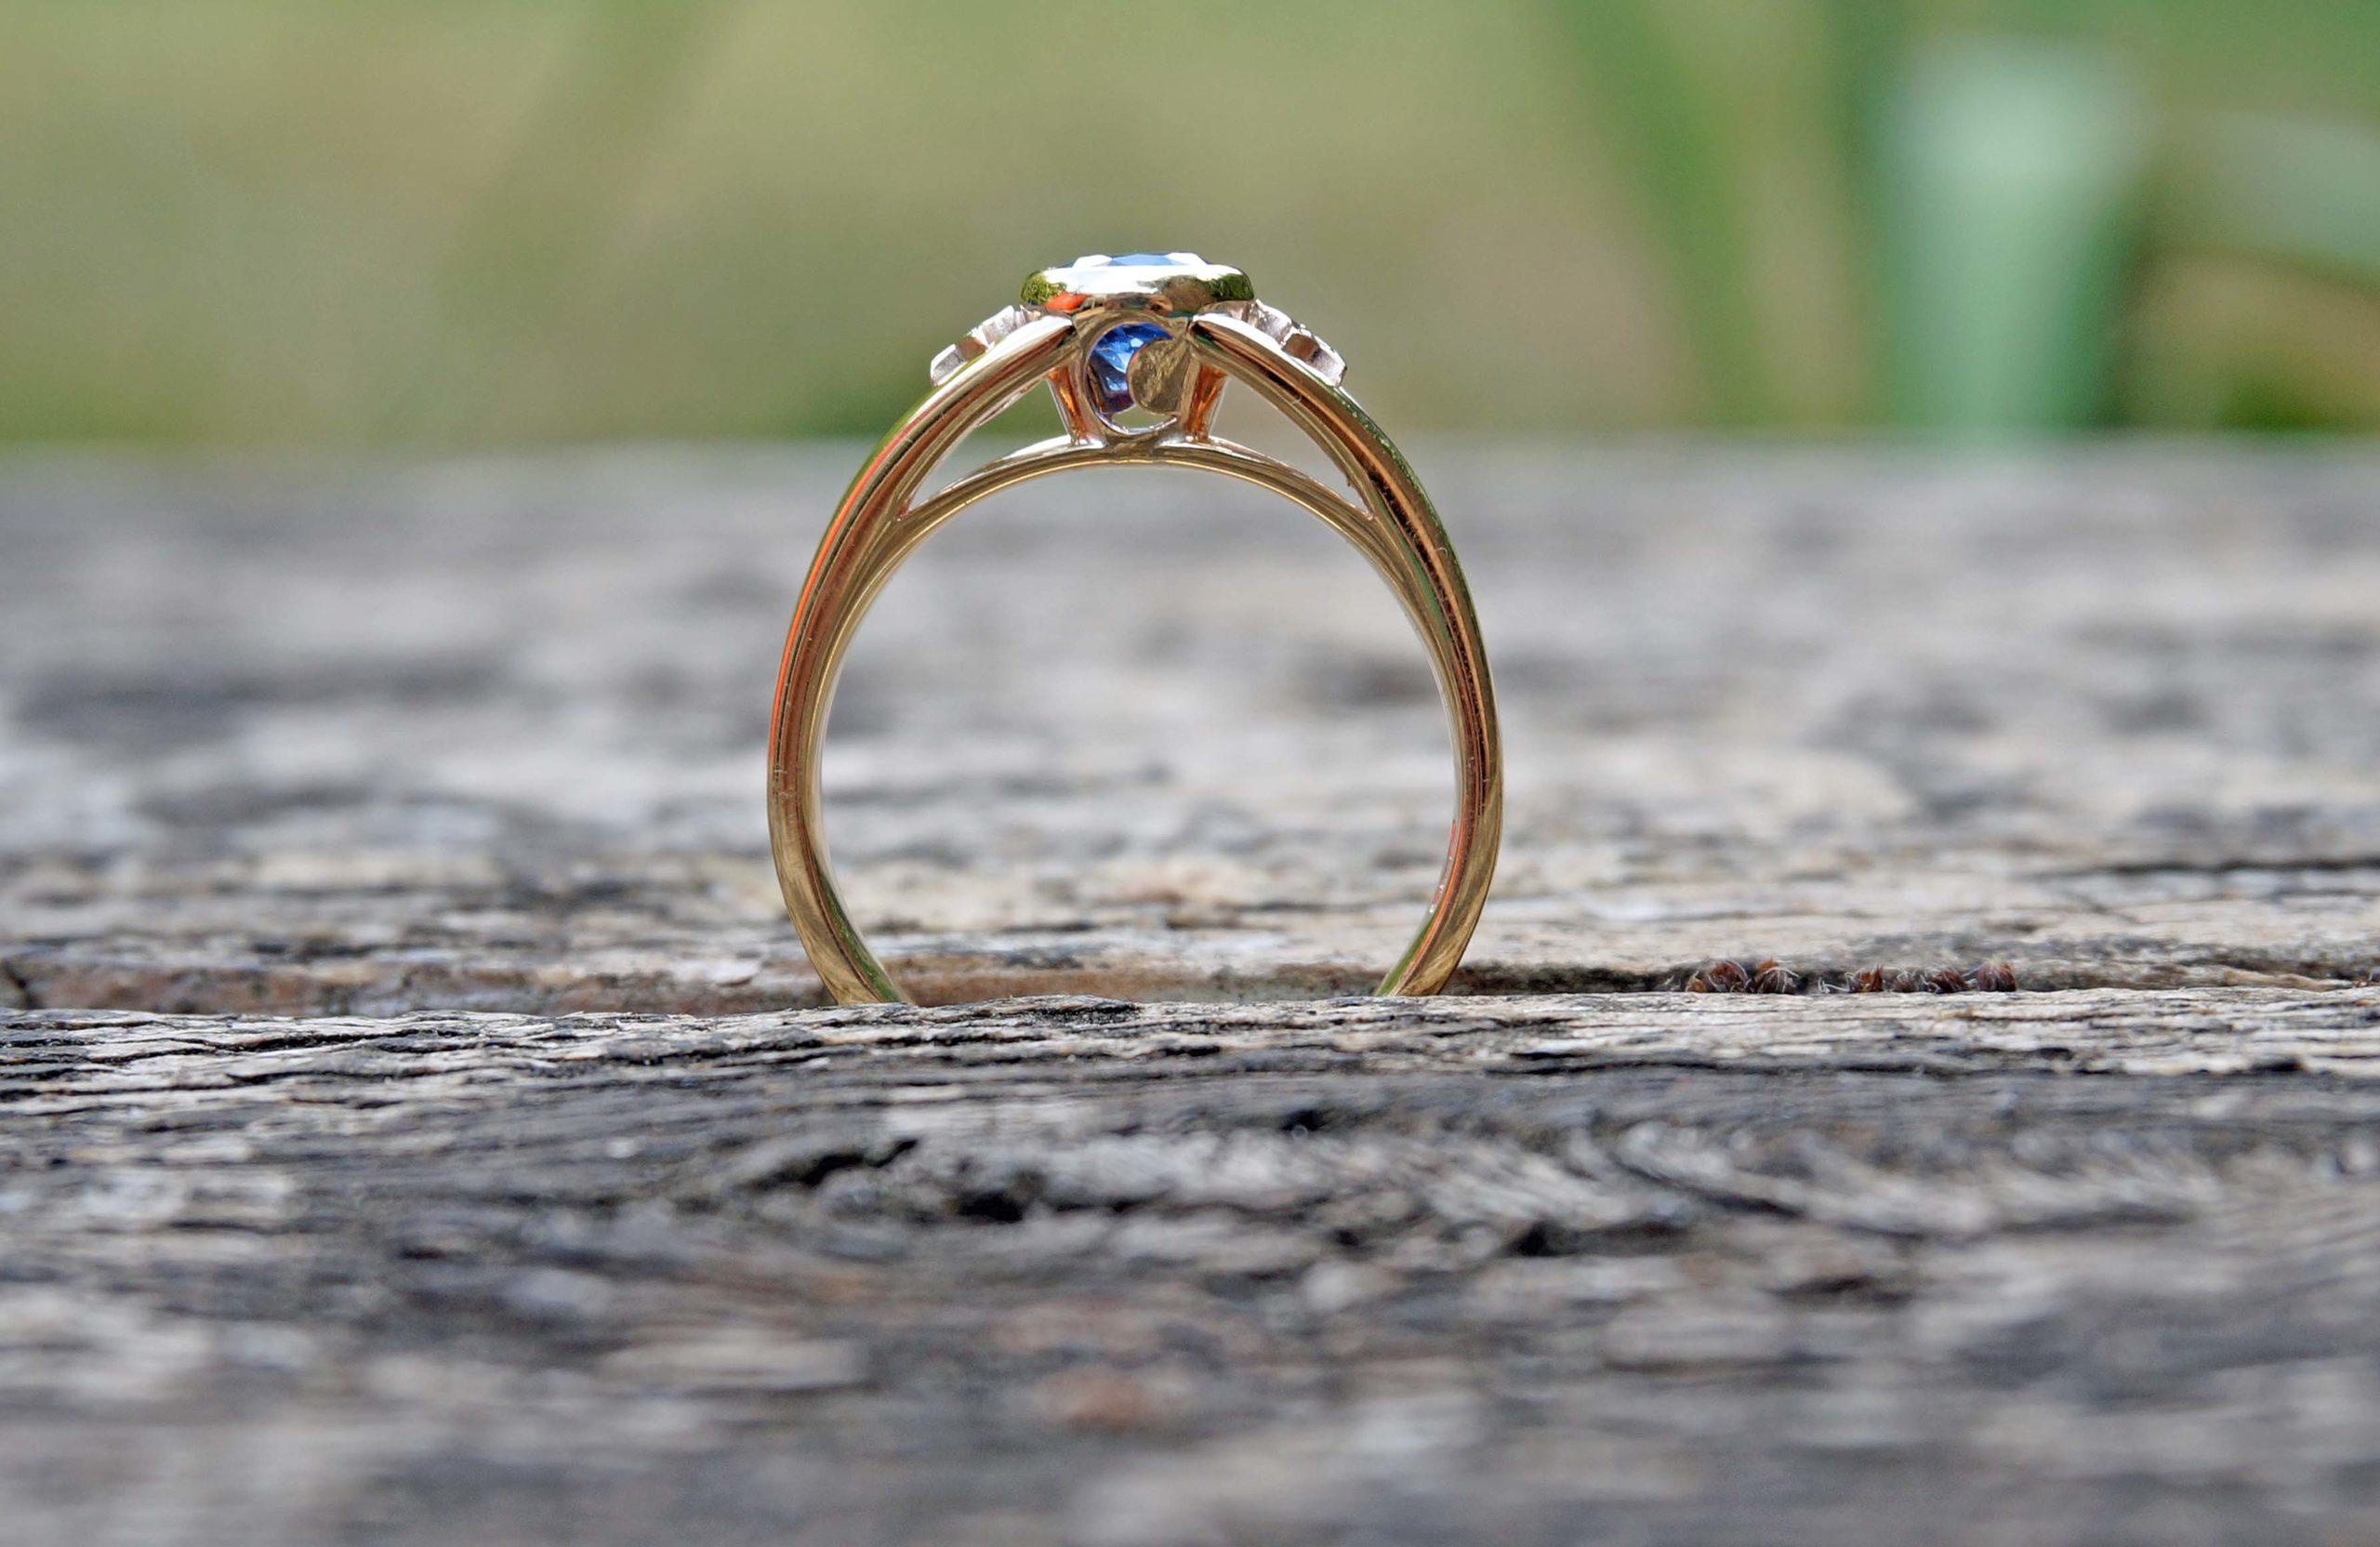 Park Road Jewellery, Bespoke Handmade Sapphire Diamond Engagement Wedding Ring Yellow Gold Personalized Moon and Stars Ring